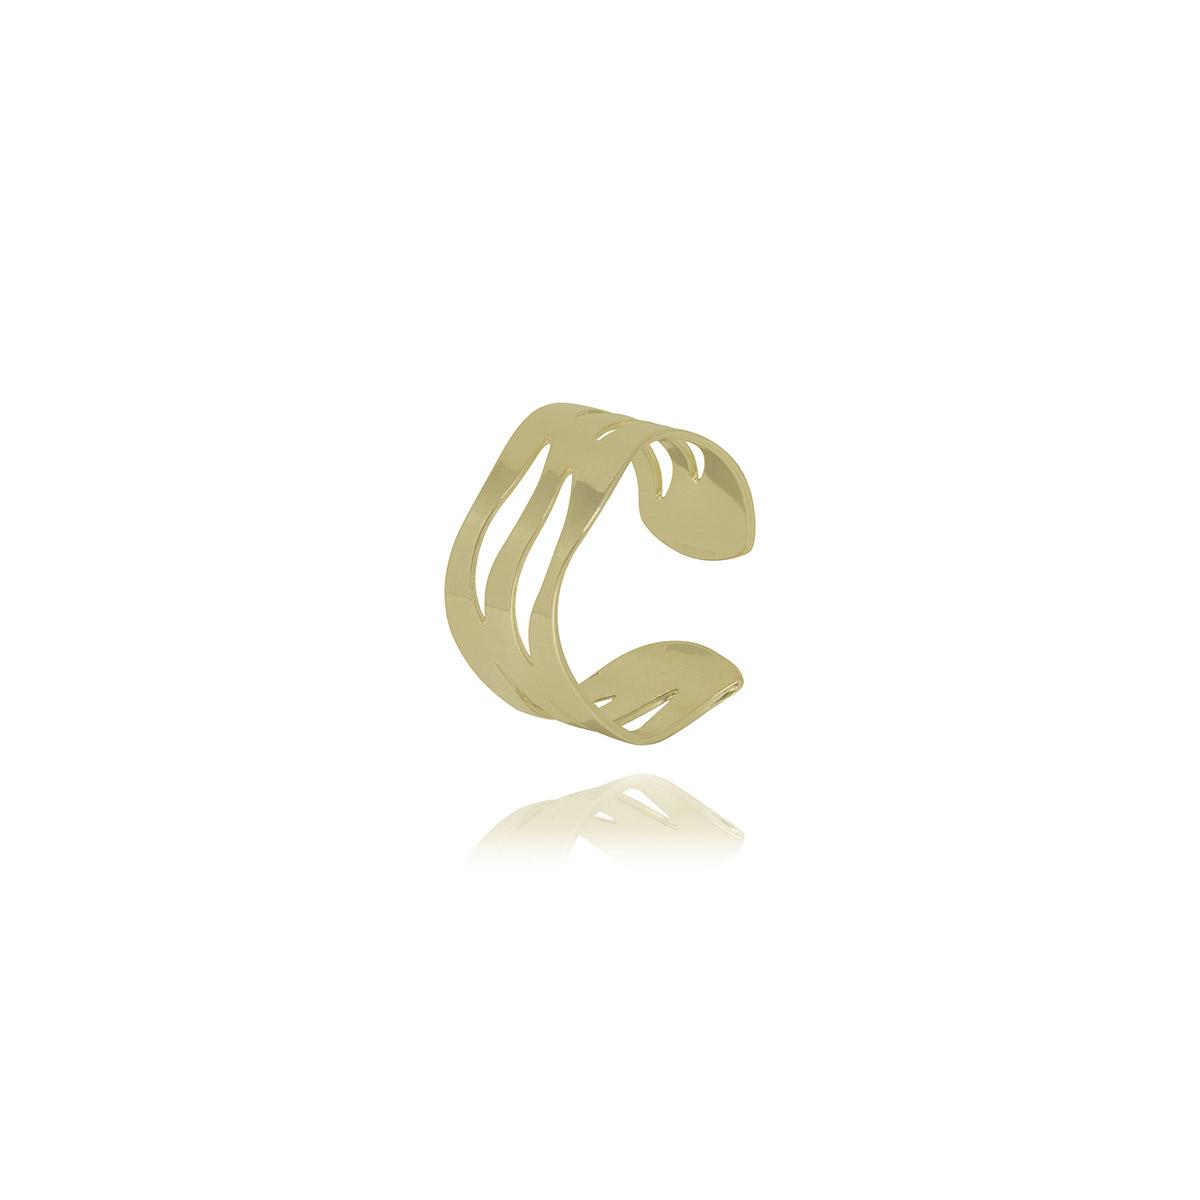 Piercing semijoia ondas vazadas folheado a ouro 18k ou ródio